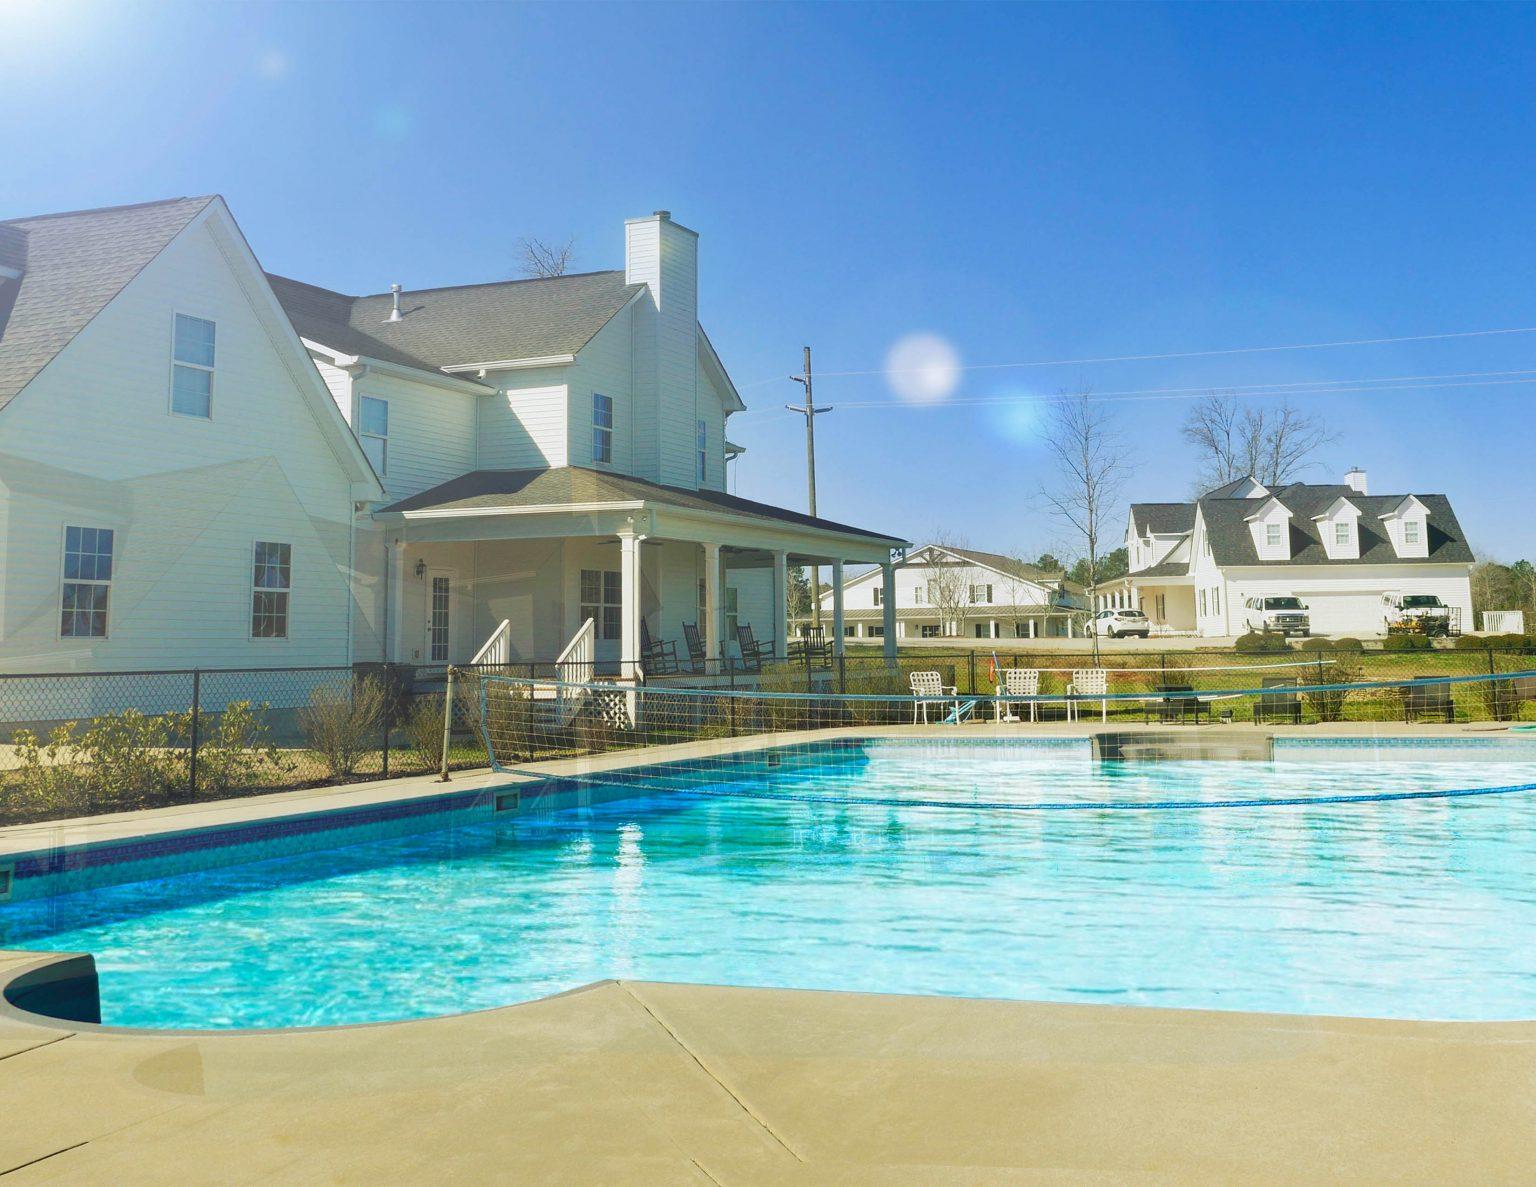 new new pool